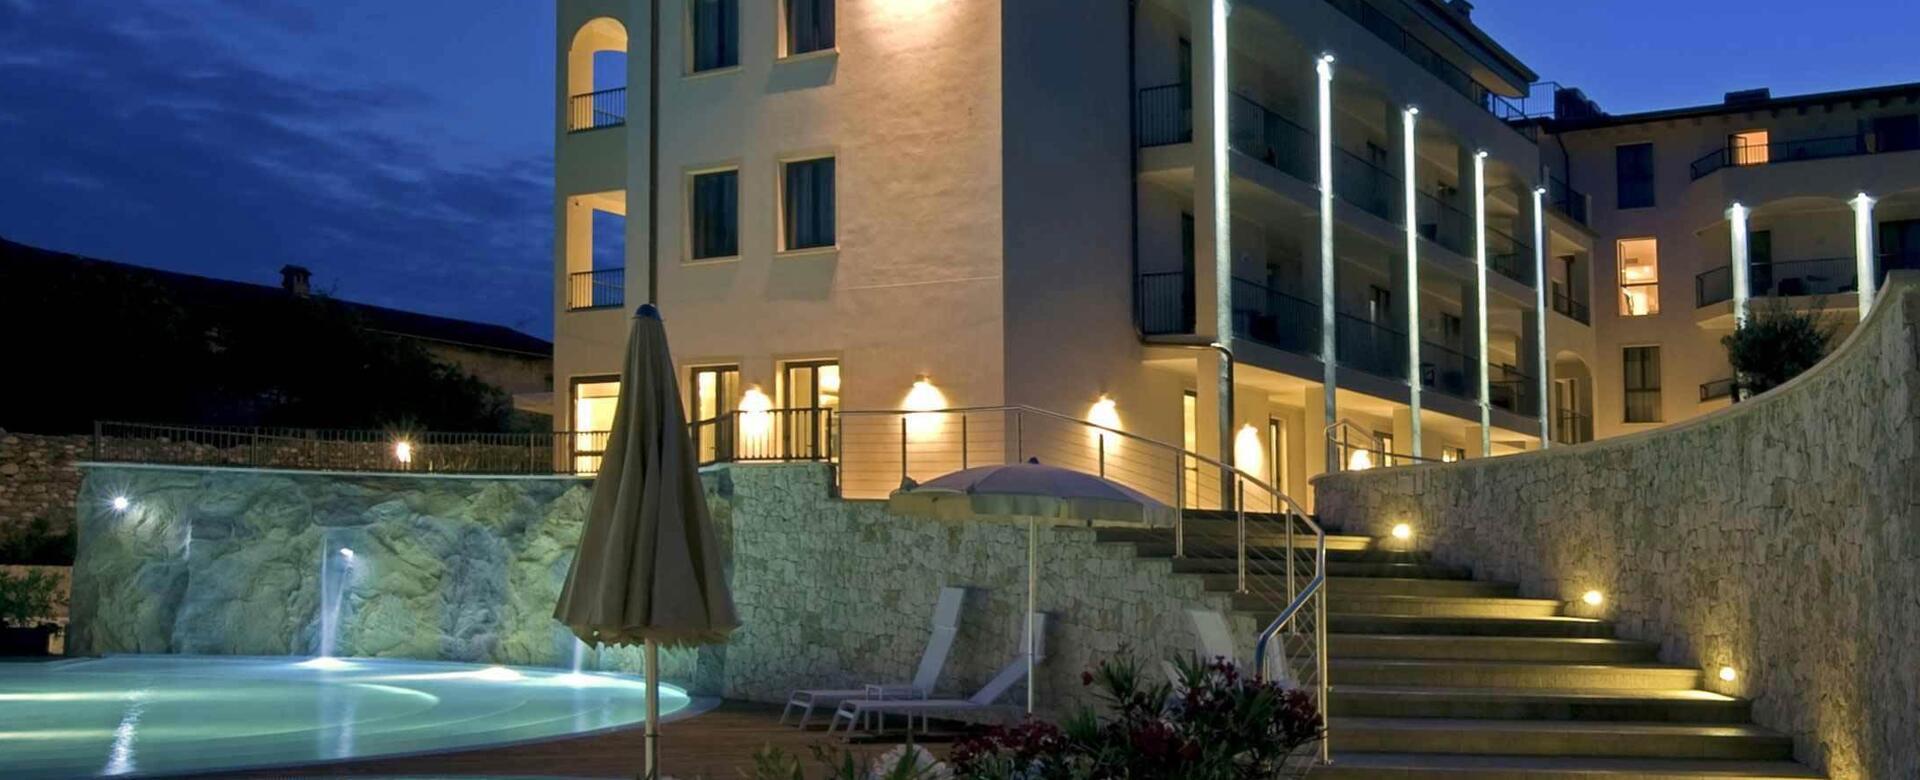 hotelvillaluisa en gardasee 004